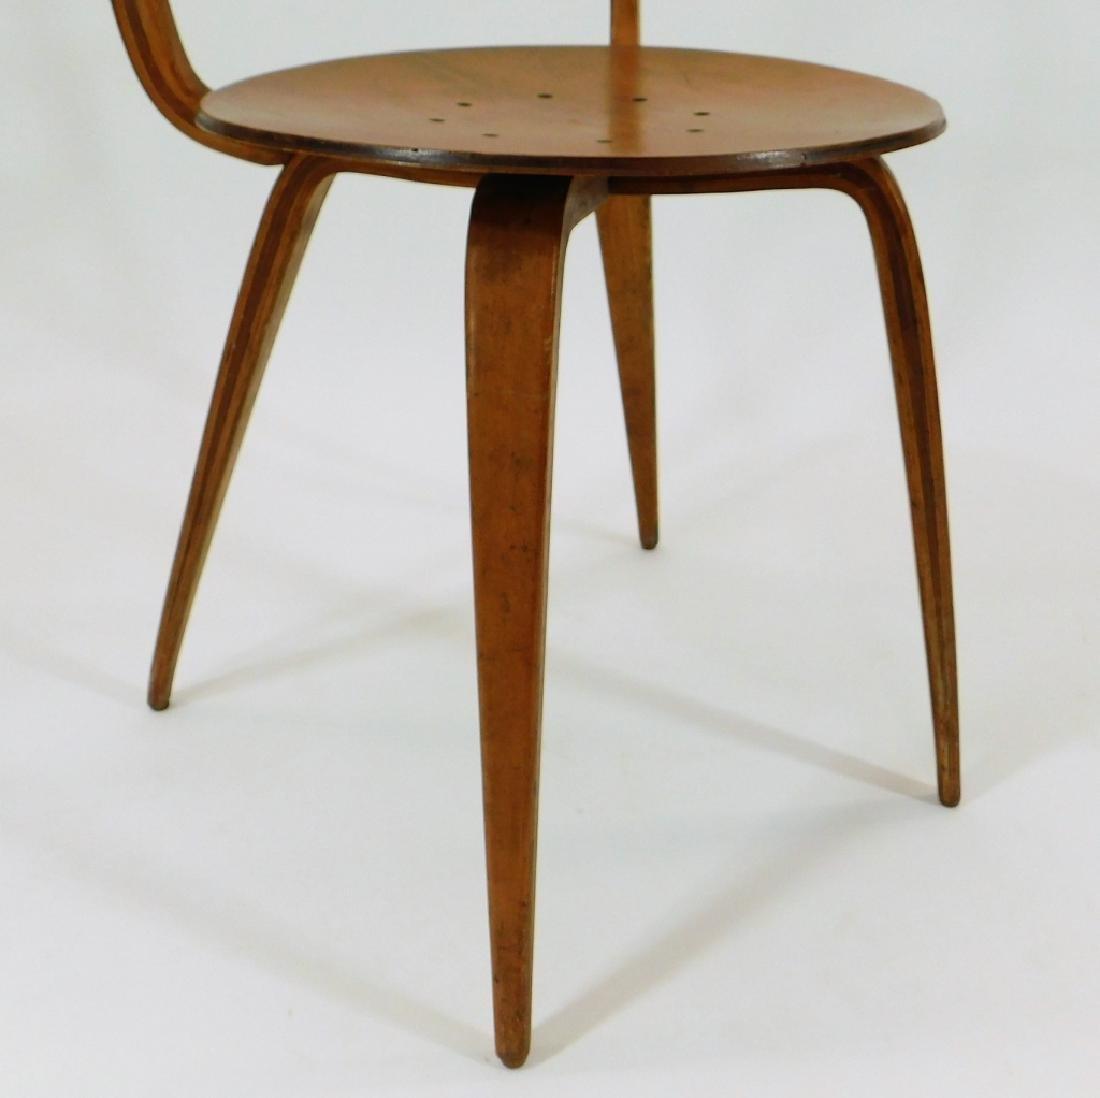 MCM George Nelson Herman Miller Pretzel Chair - 3